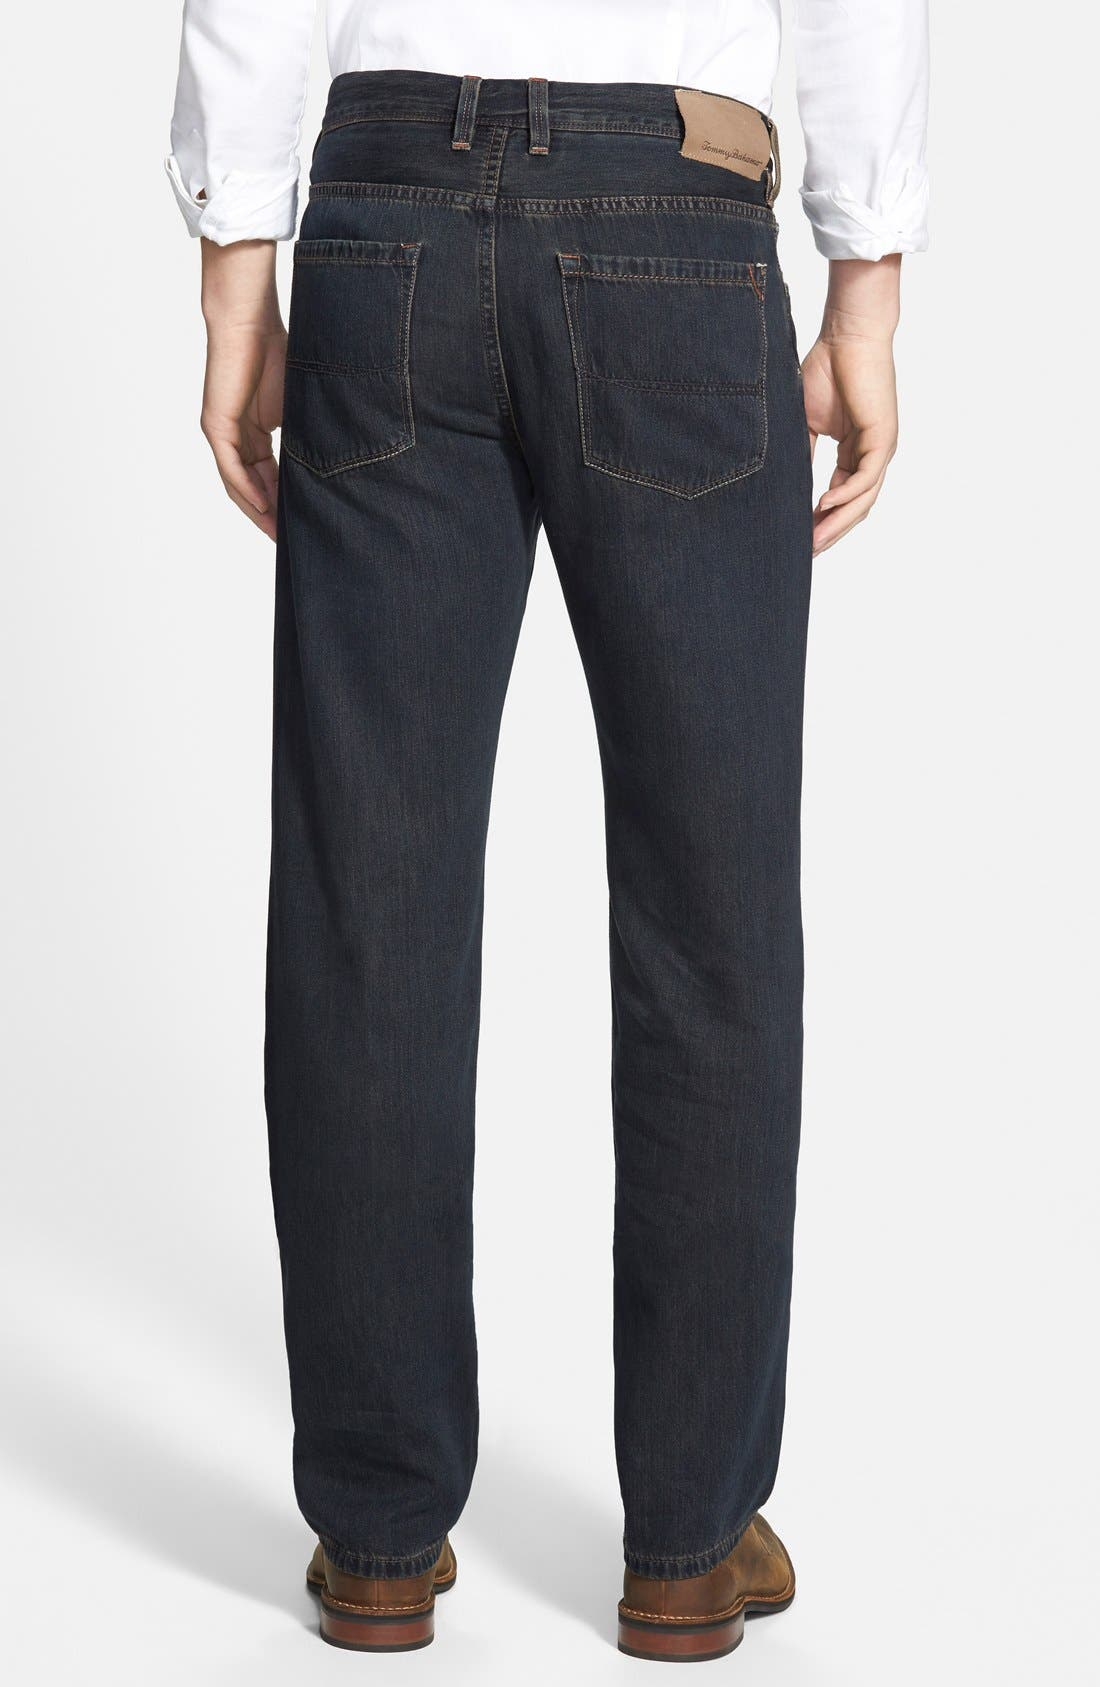 Alternate Image 3  - Tommy Bahama Denim 'Coastal Island' Standard Fit Jeans (Black Overdye)